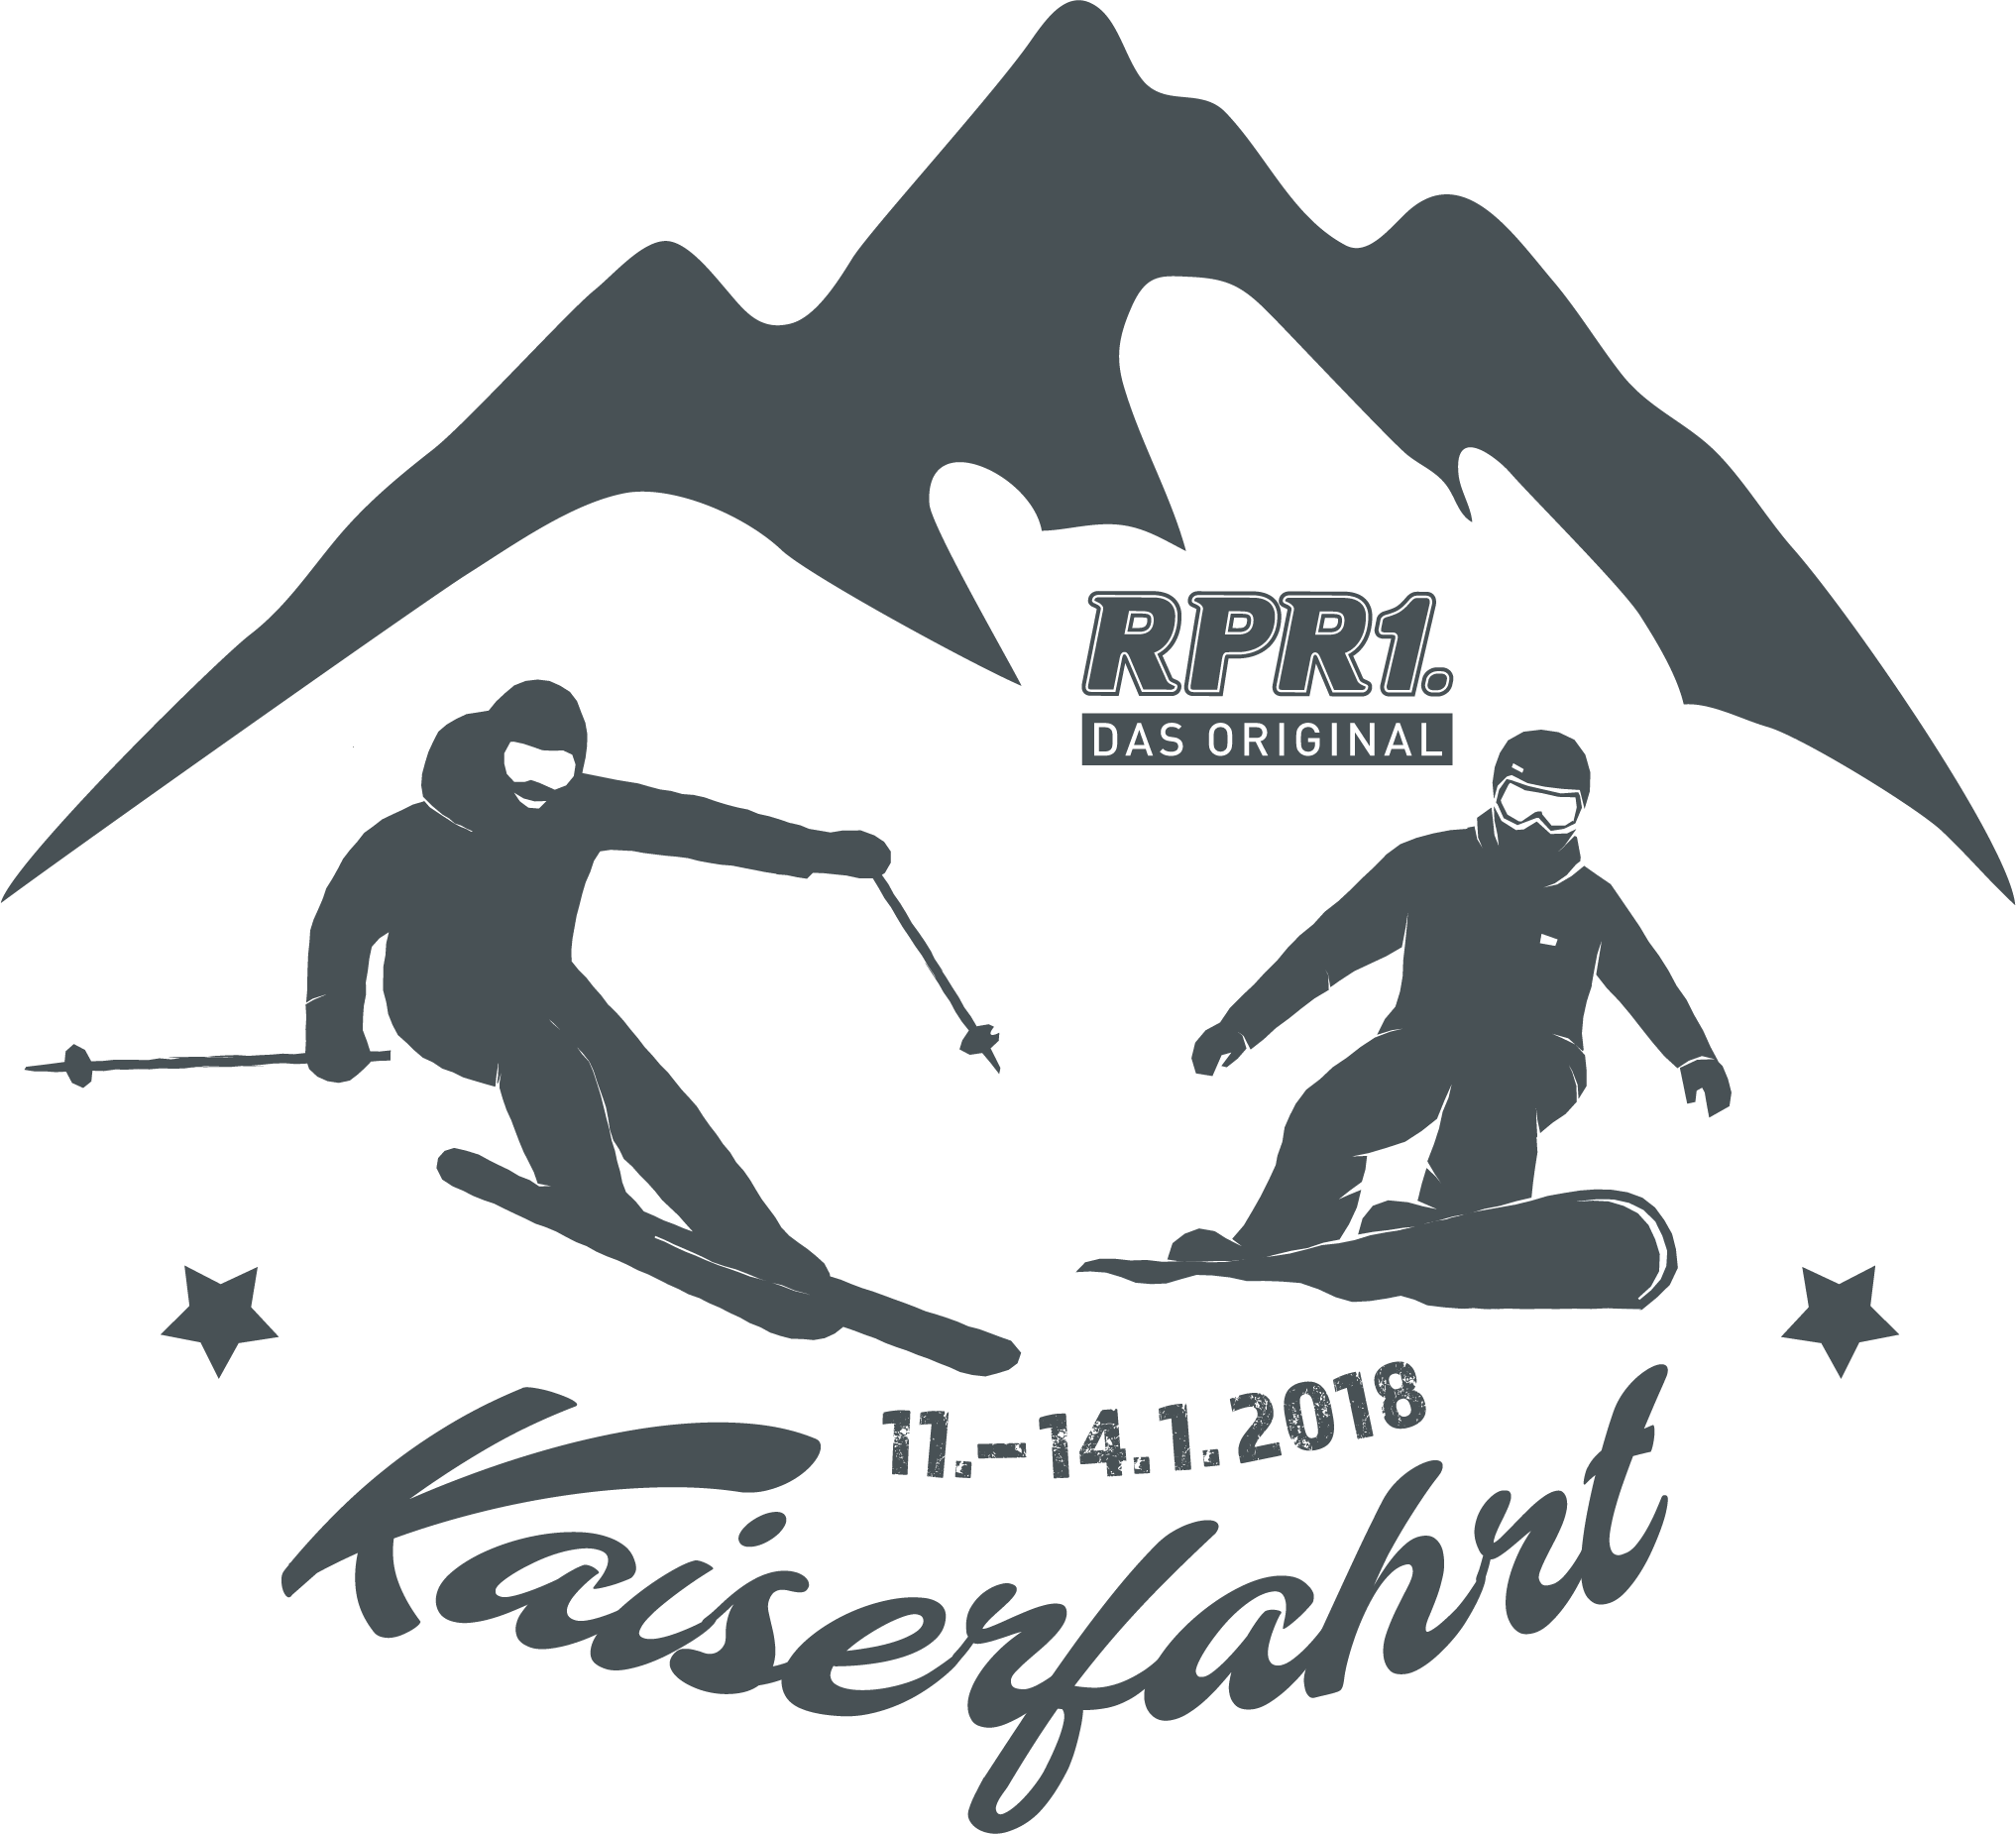 Kaiserfahrt_CONTENT_RPR1_Ski2017_RZ.PNG